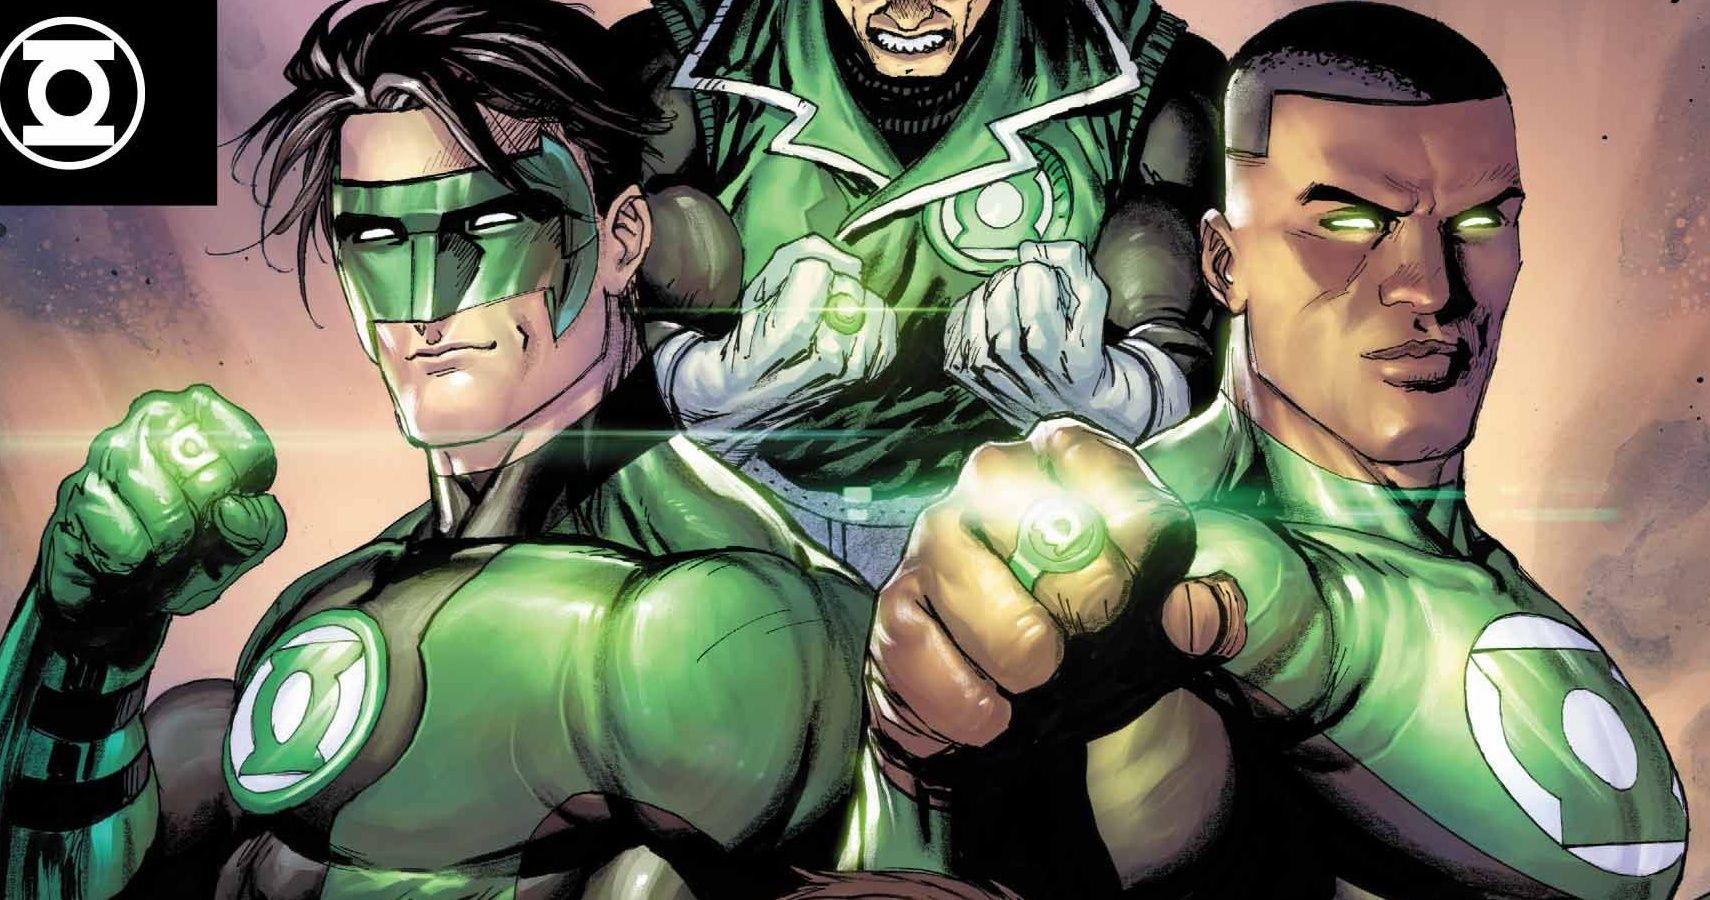 5 Reasons John Stewart Is The Best Green Lantern 5 Reasons It S Kyle Rayner